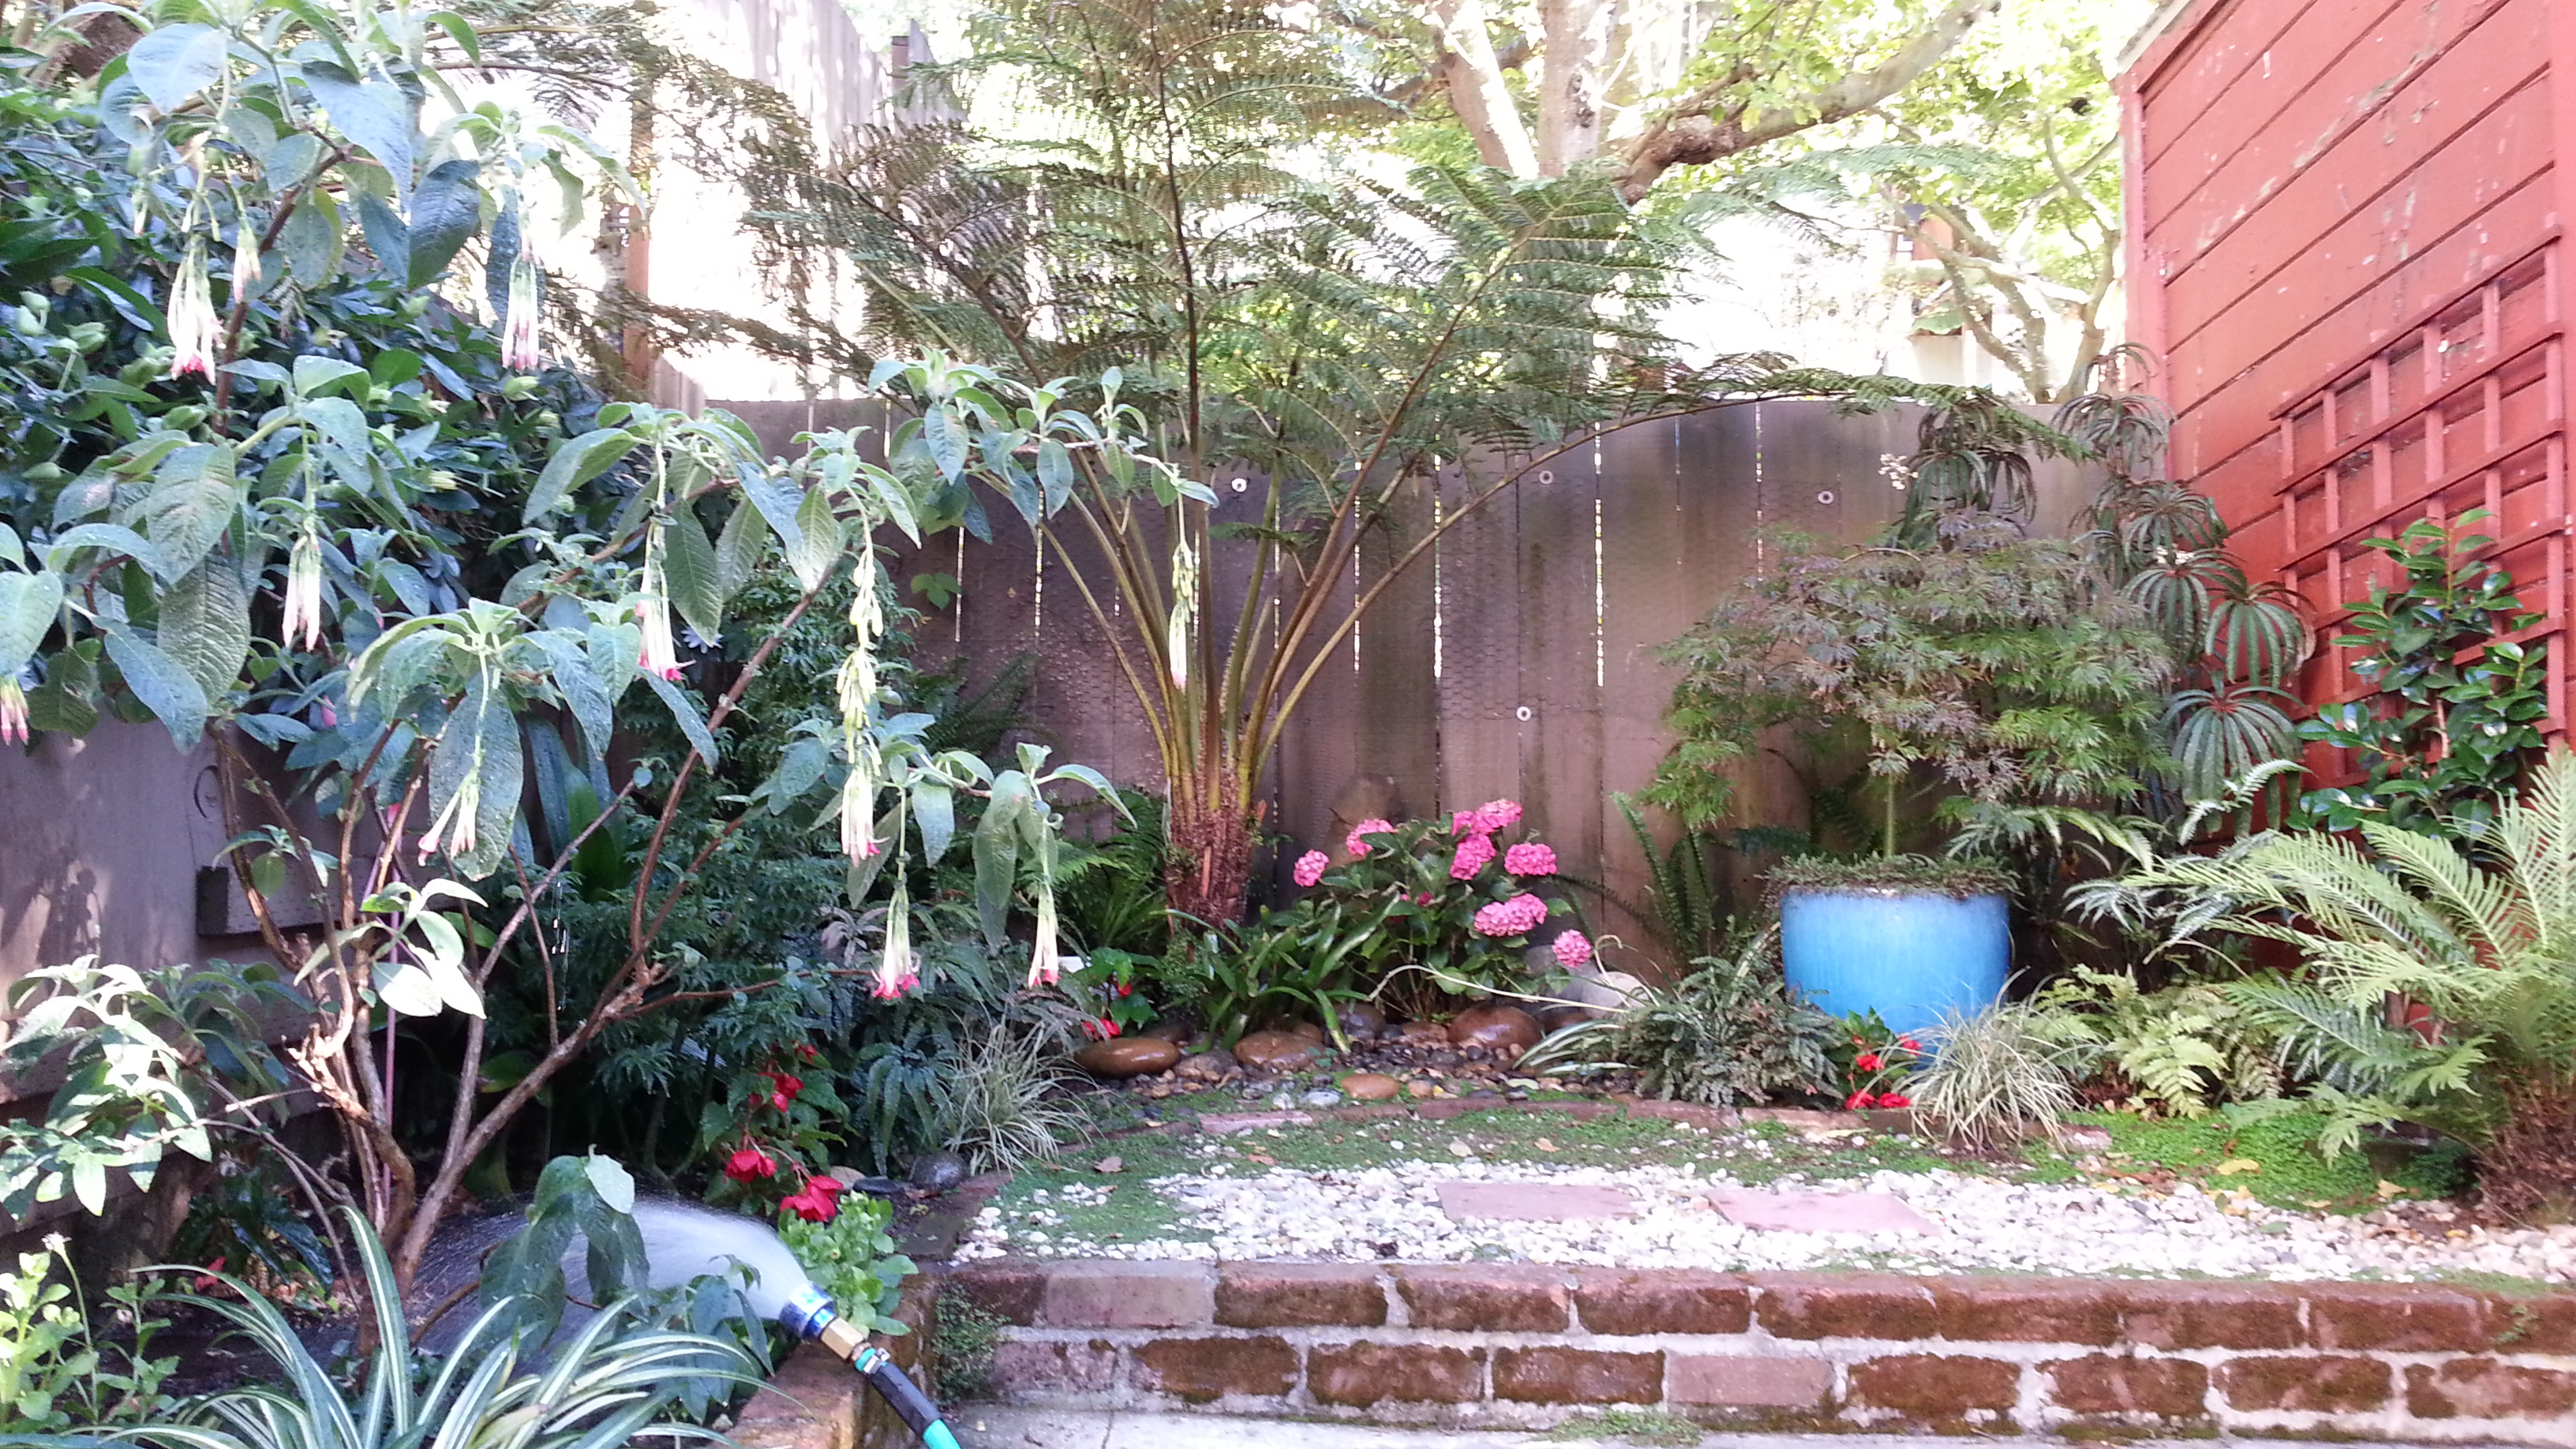 putzing around the grotto bozannical gardens